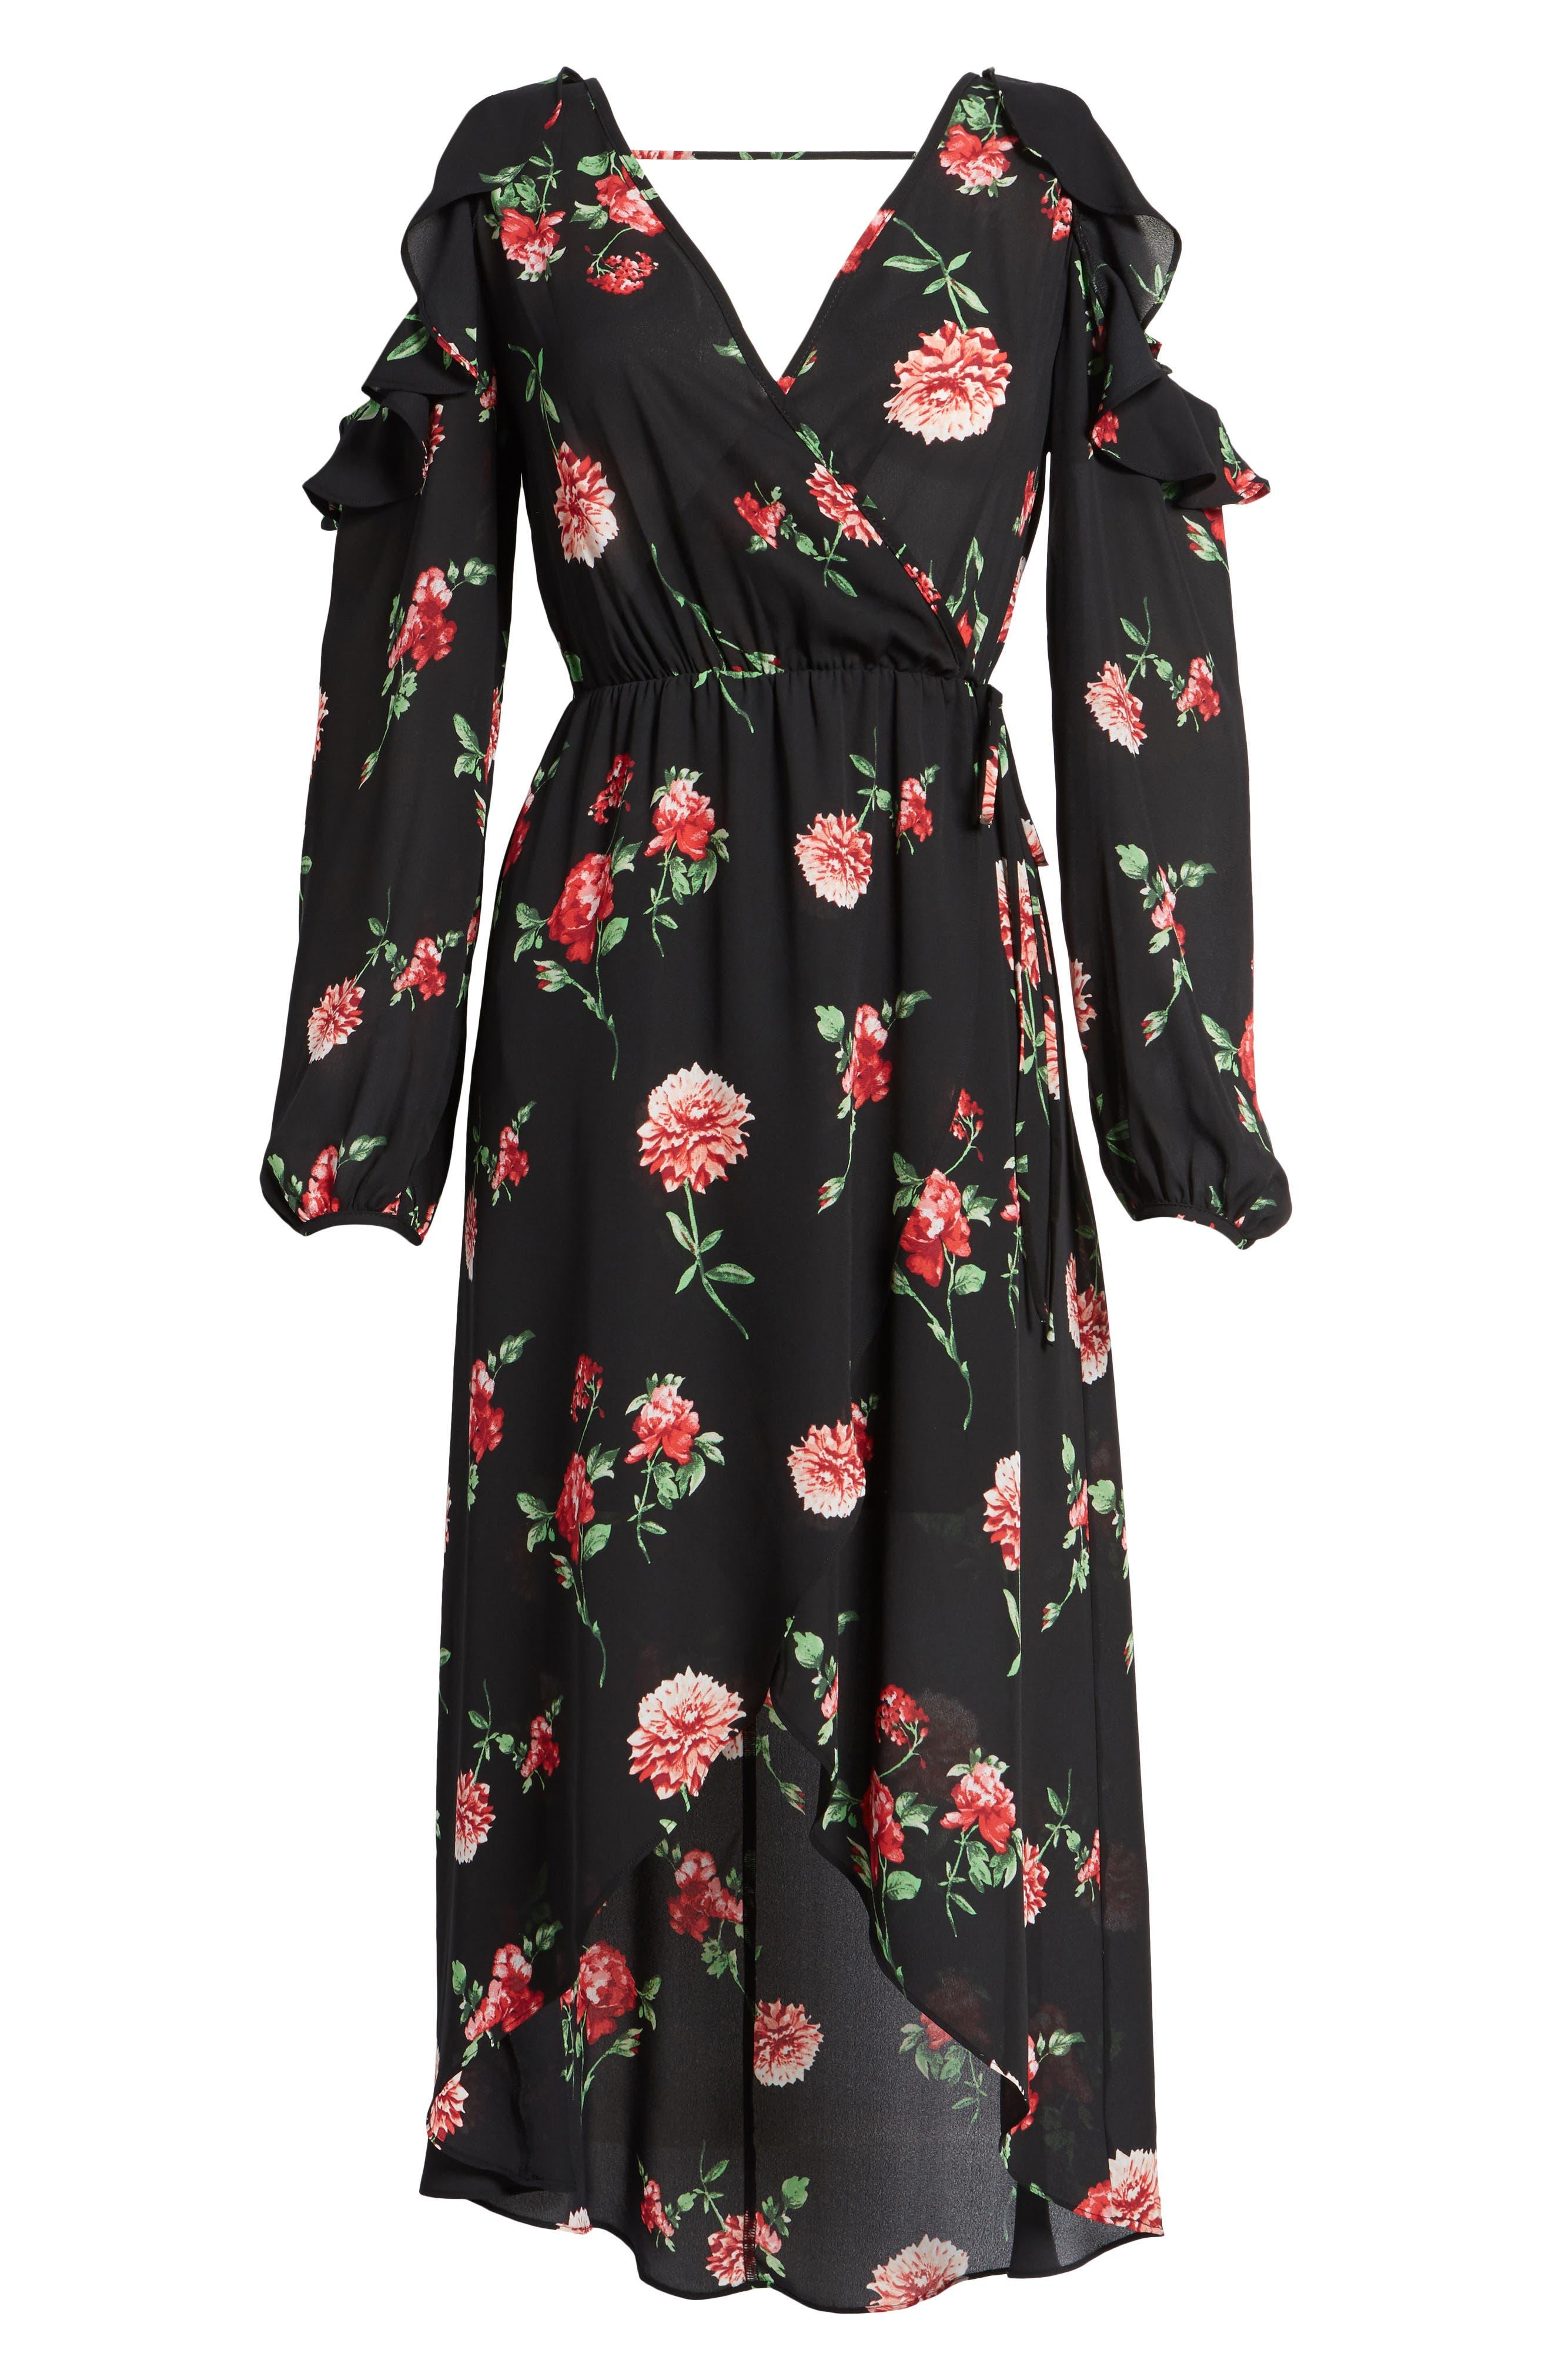 Ruffle Cold Shoulder Faux Wrap Dress,                             Alternate thumbnail 6, color,                             750 Black Red